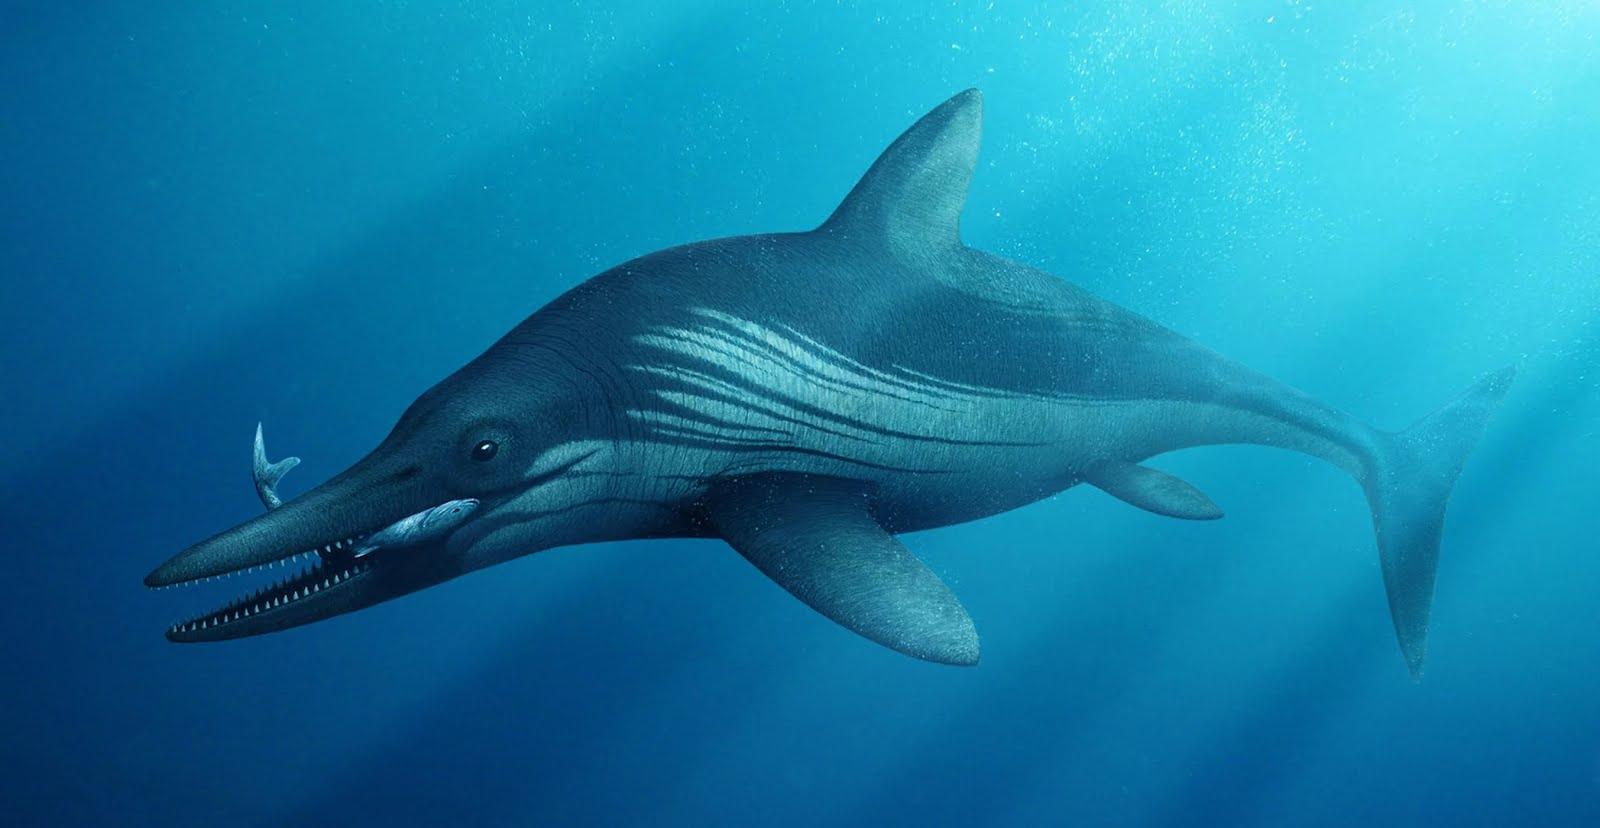 protoichthyosaurus_prostaxalis_bob_nicholls.jpg